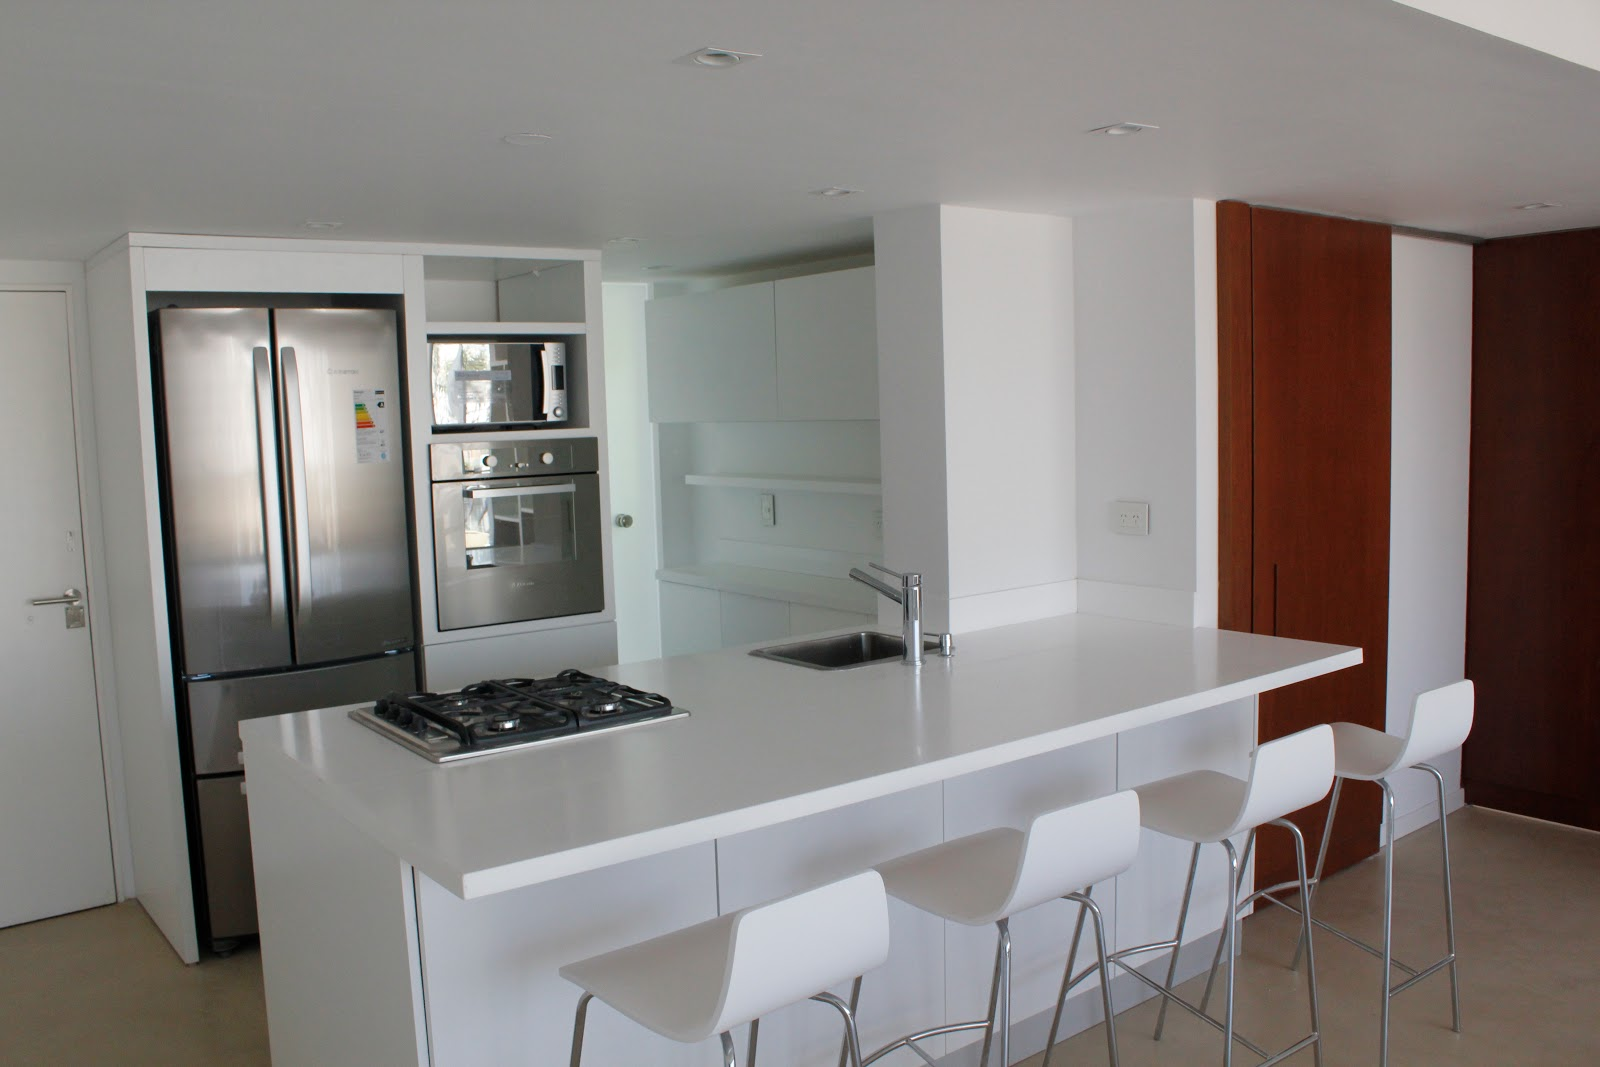 Kasa cocina minimalista blanca by architect julieta for Kasa diseno interior